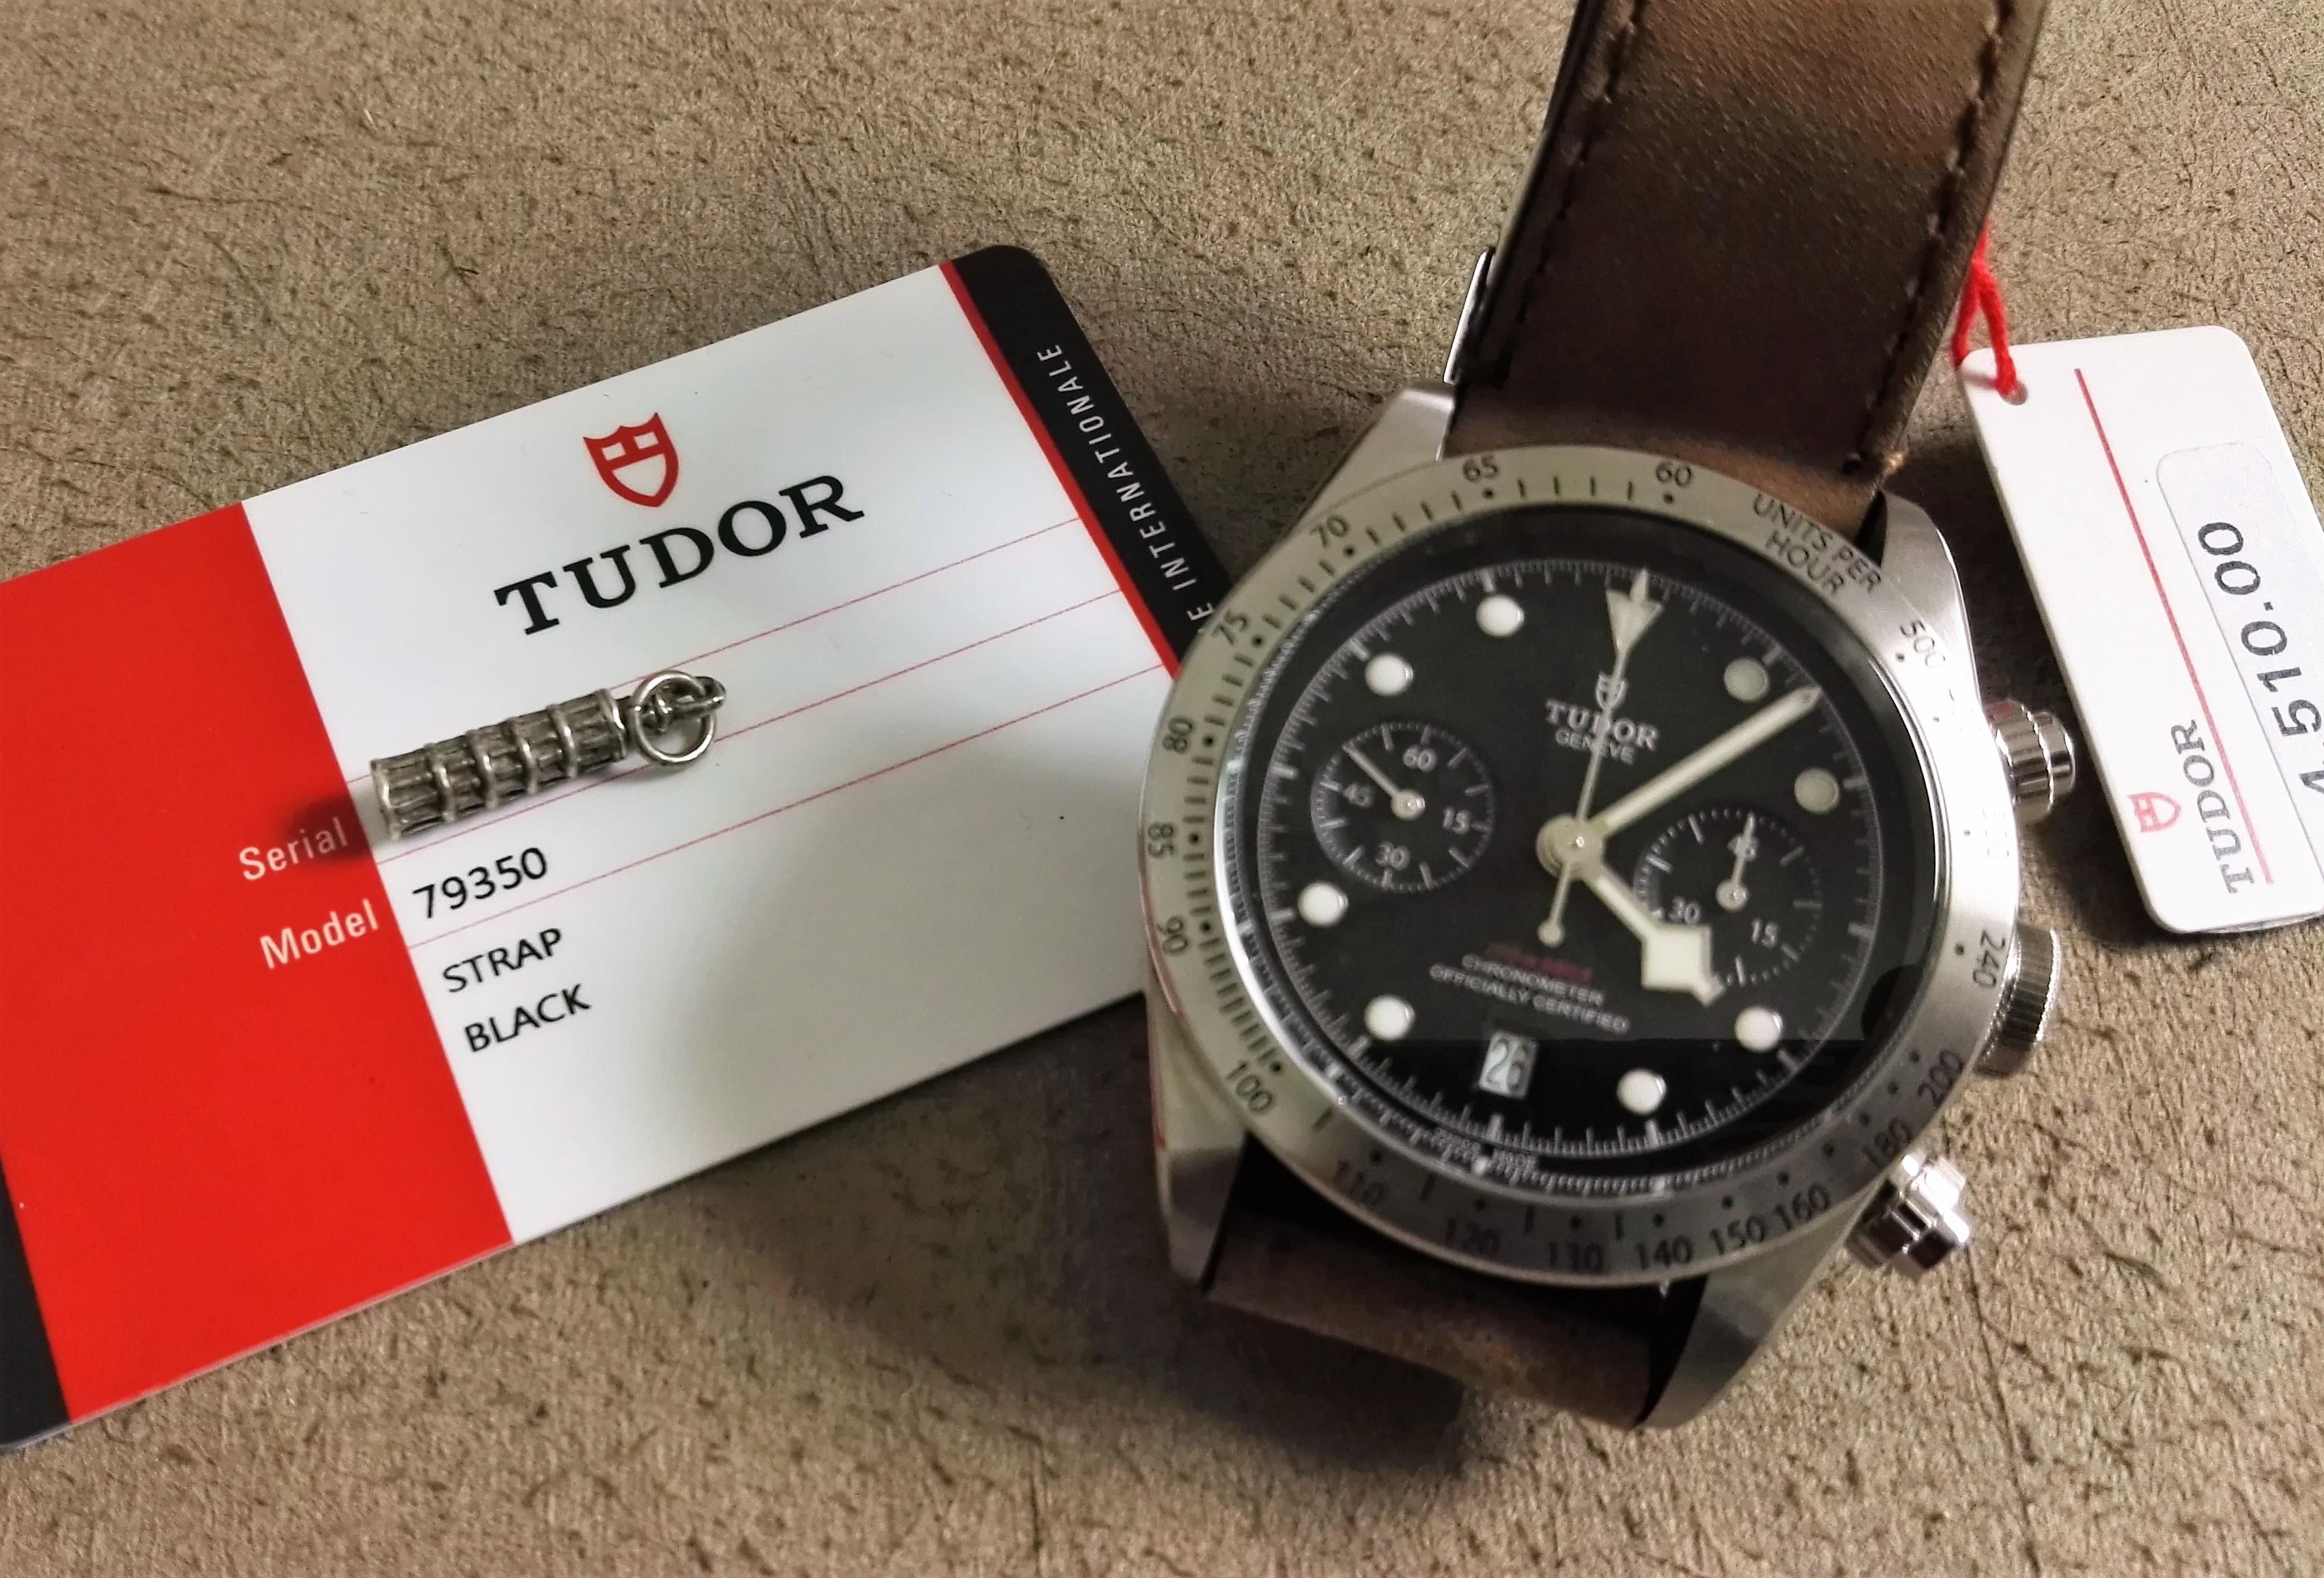 Tudor Heritage Black Bay Black Bay Chrono 79350 New 2019 box and warranty card | San Giorgio a Cremano